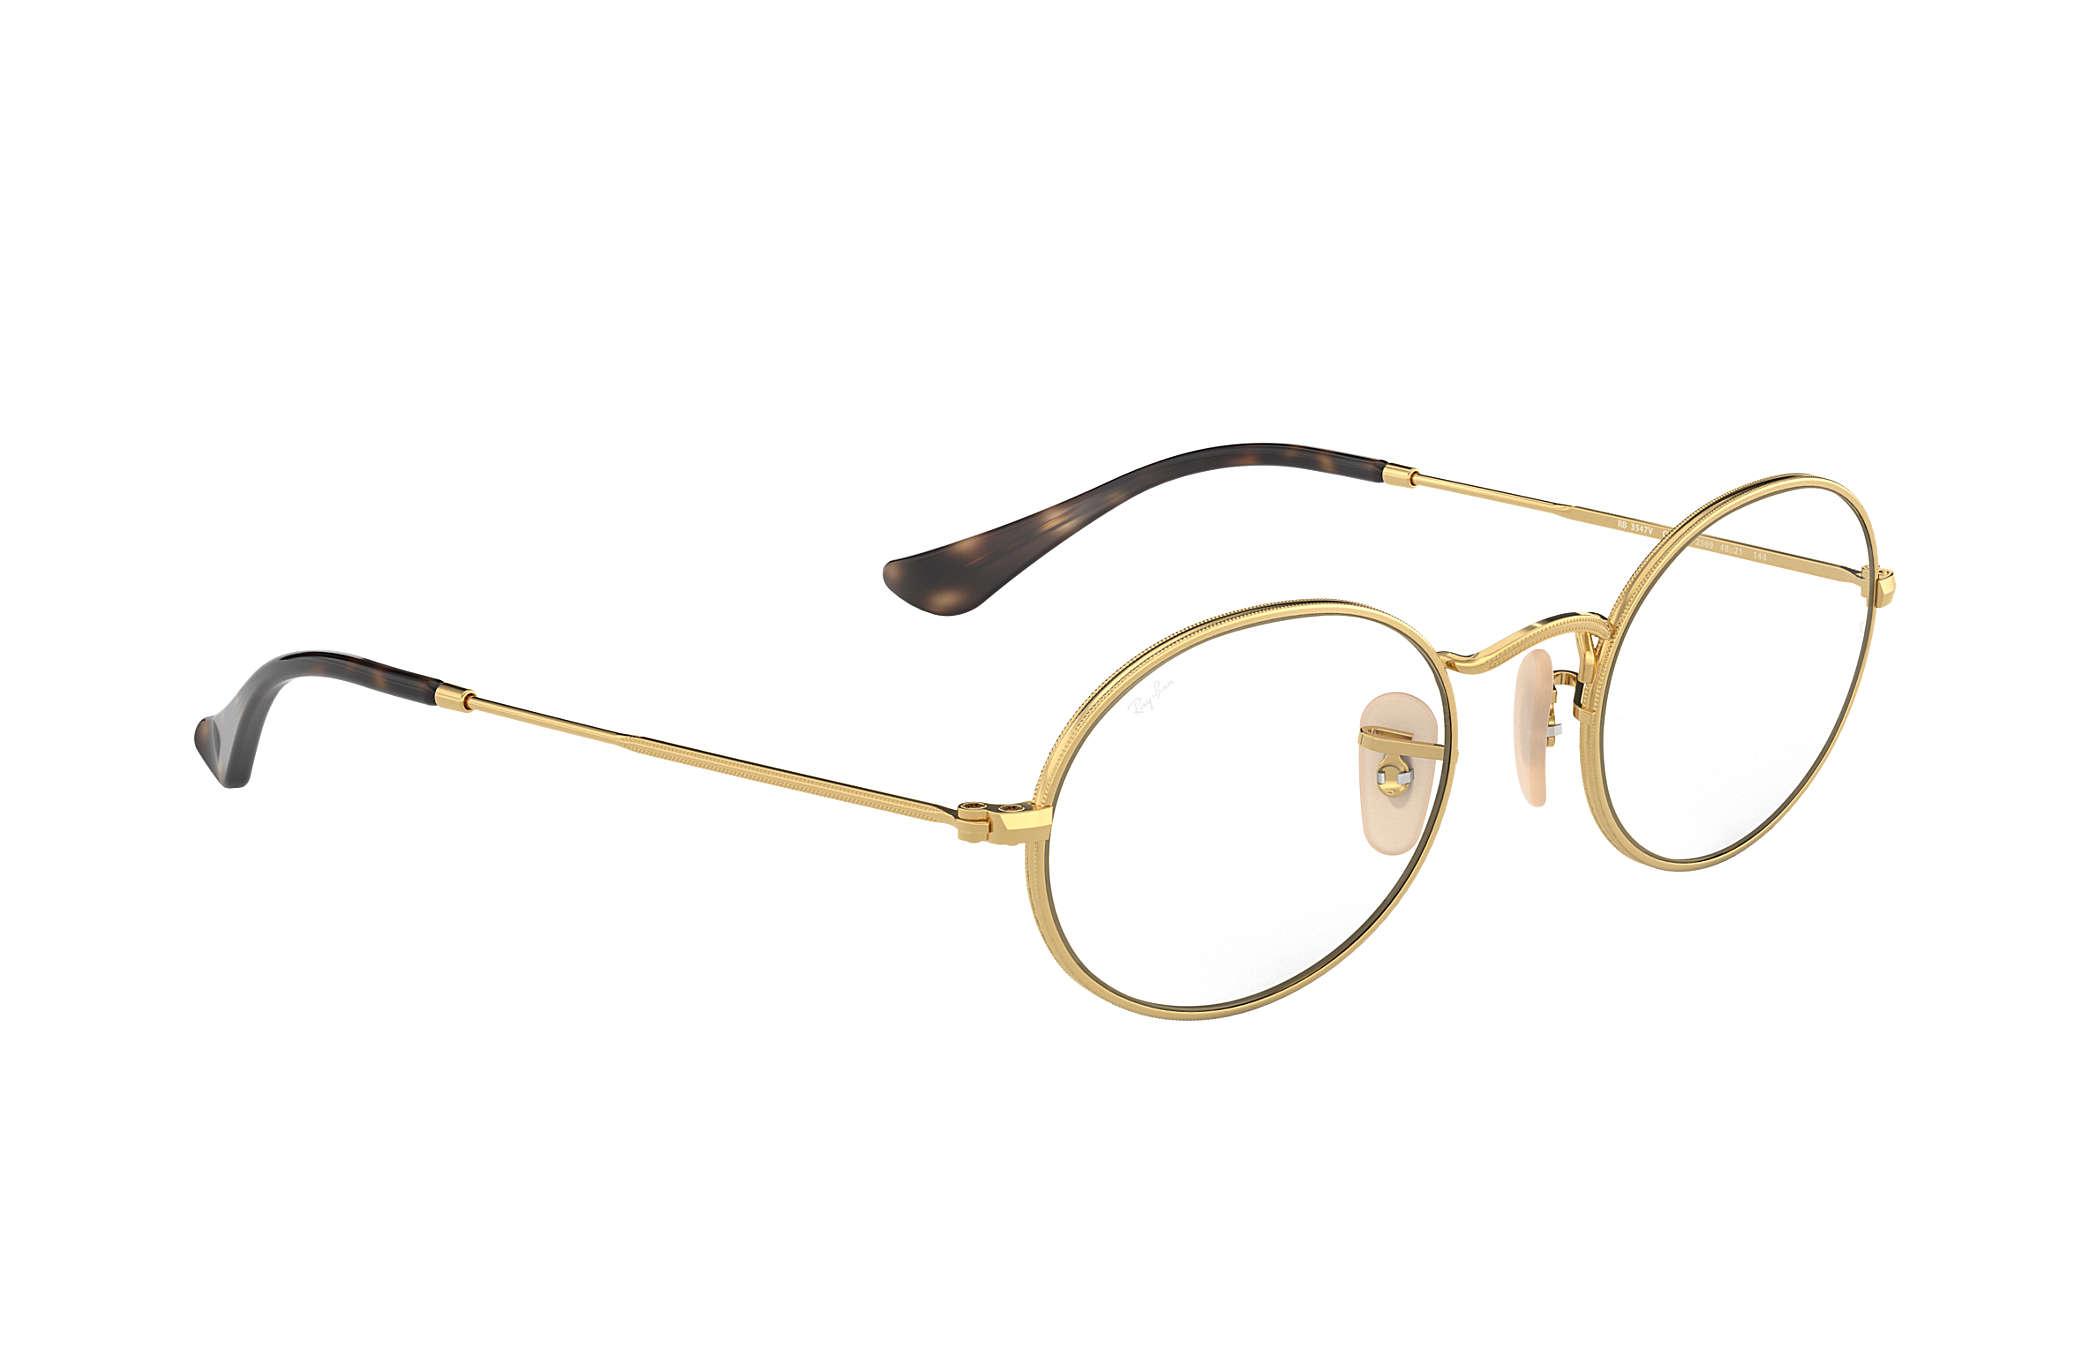 0ee4642fc5 Ray-Ban prescription glasses Oval Optics RB3547V Gold - Metal ...